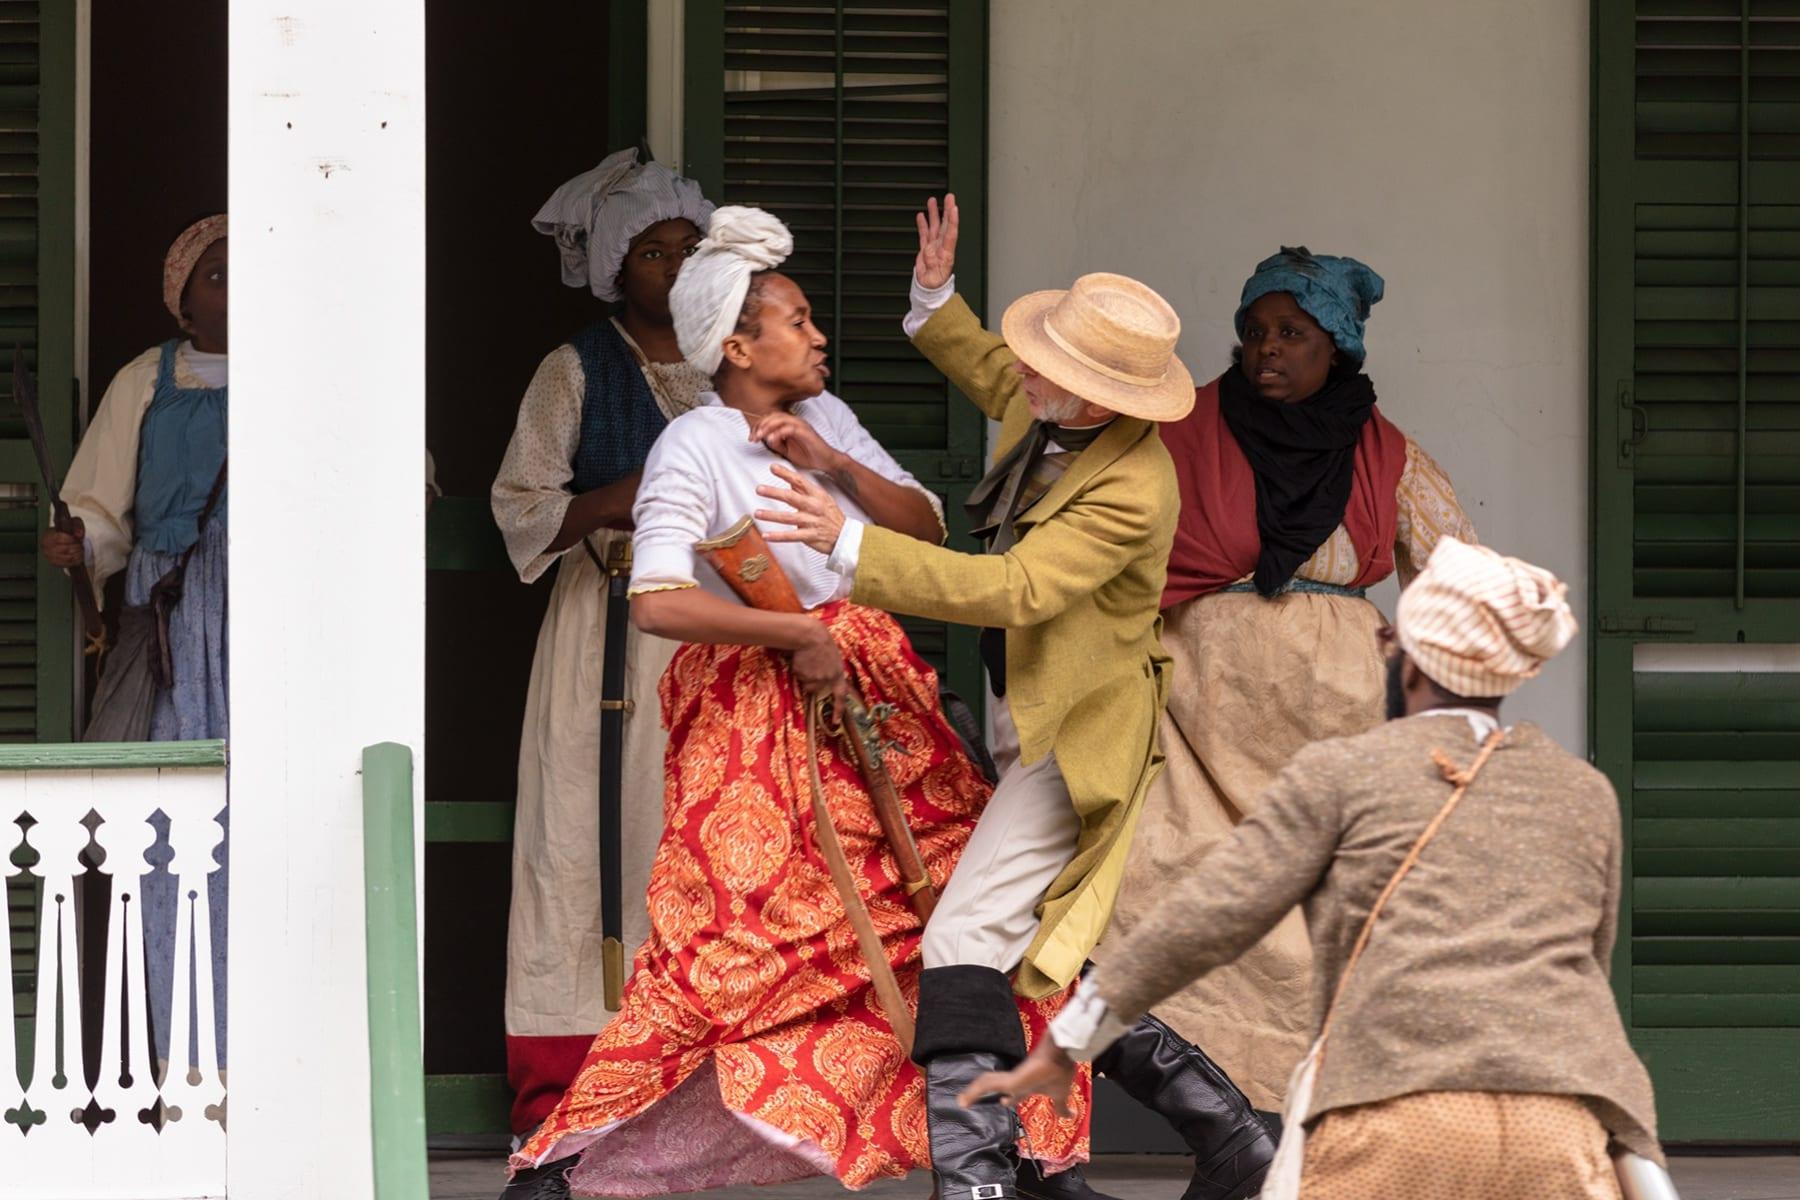 Dread Scott, Slave Rebellion Reenactment Performance Still 6, 2019